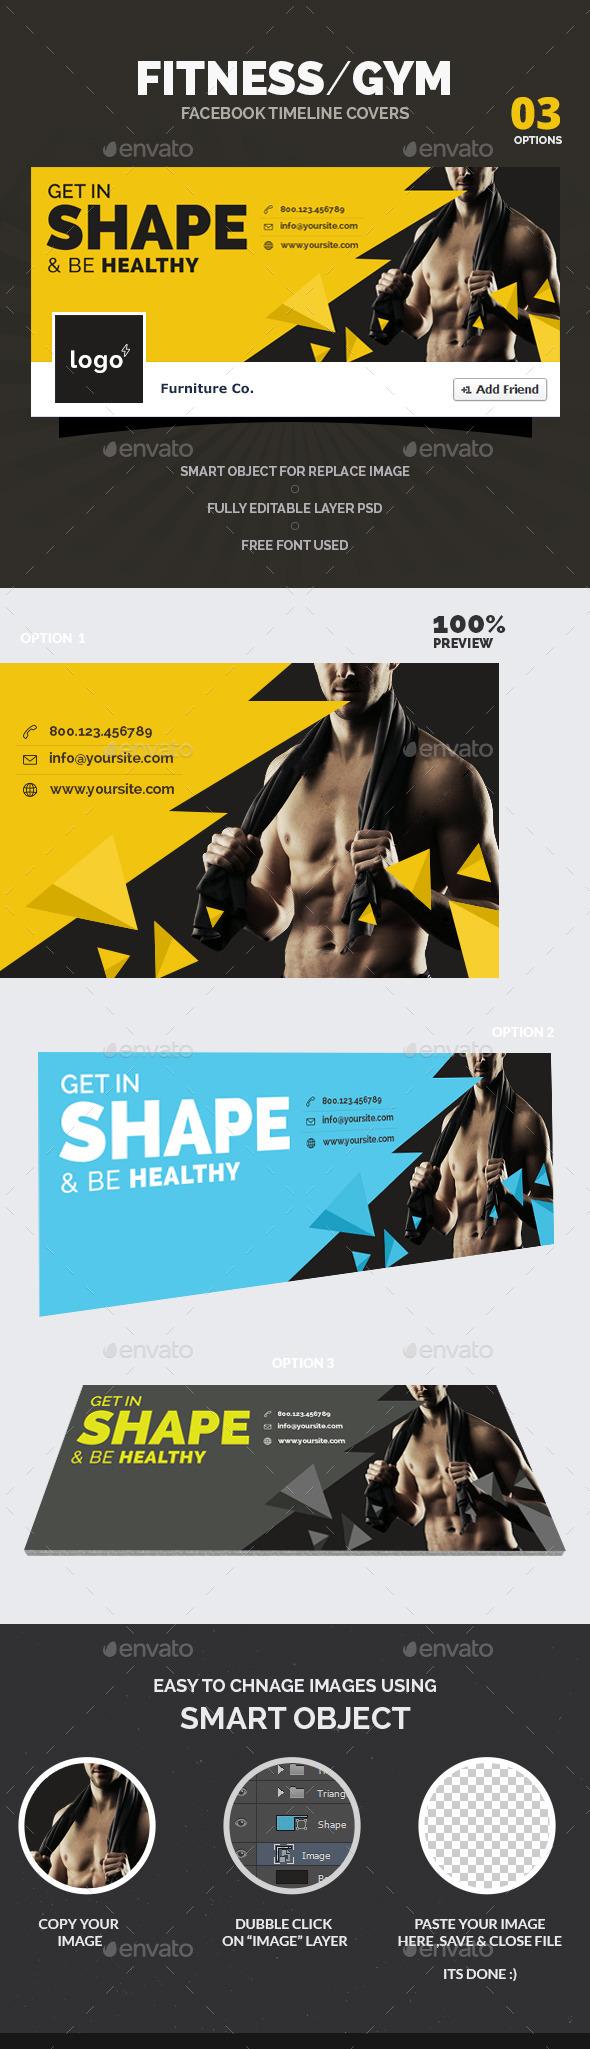 Fitness / Gym  Facebook Timeline Covers - Facebook Timeline Covers Social Media